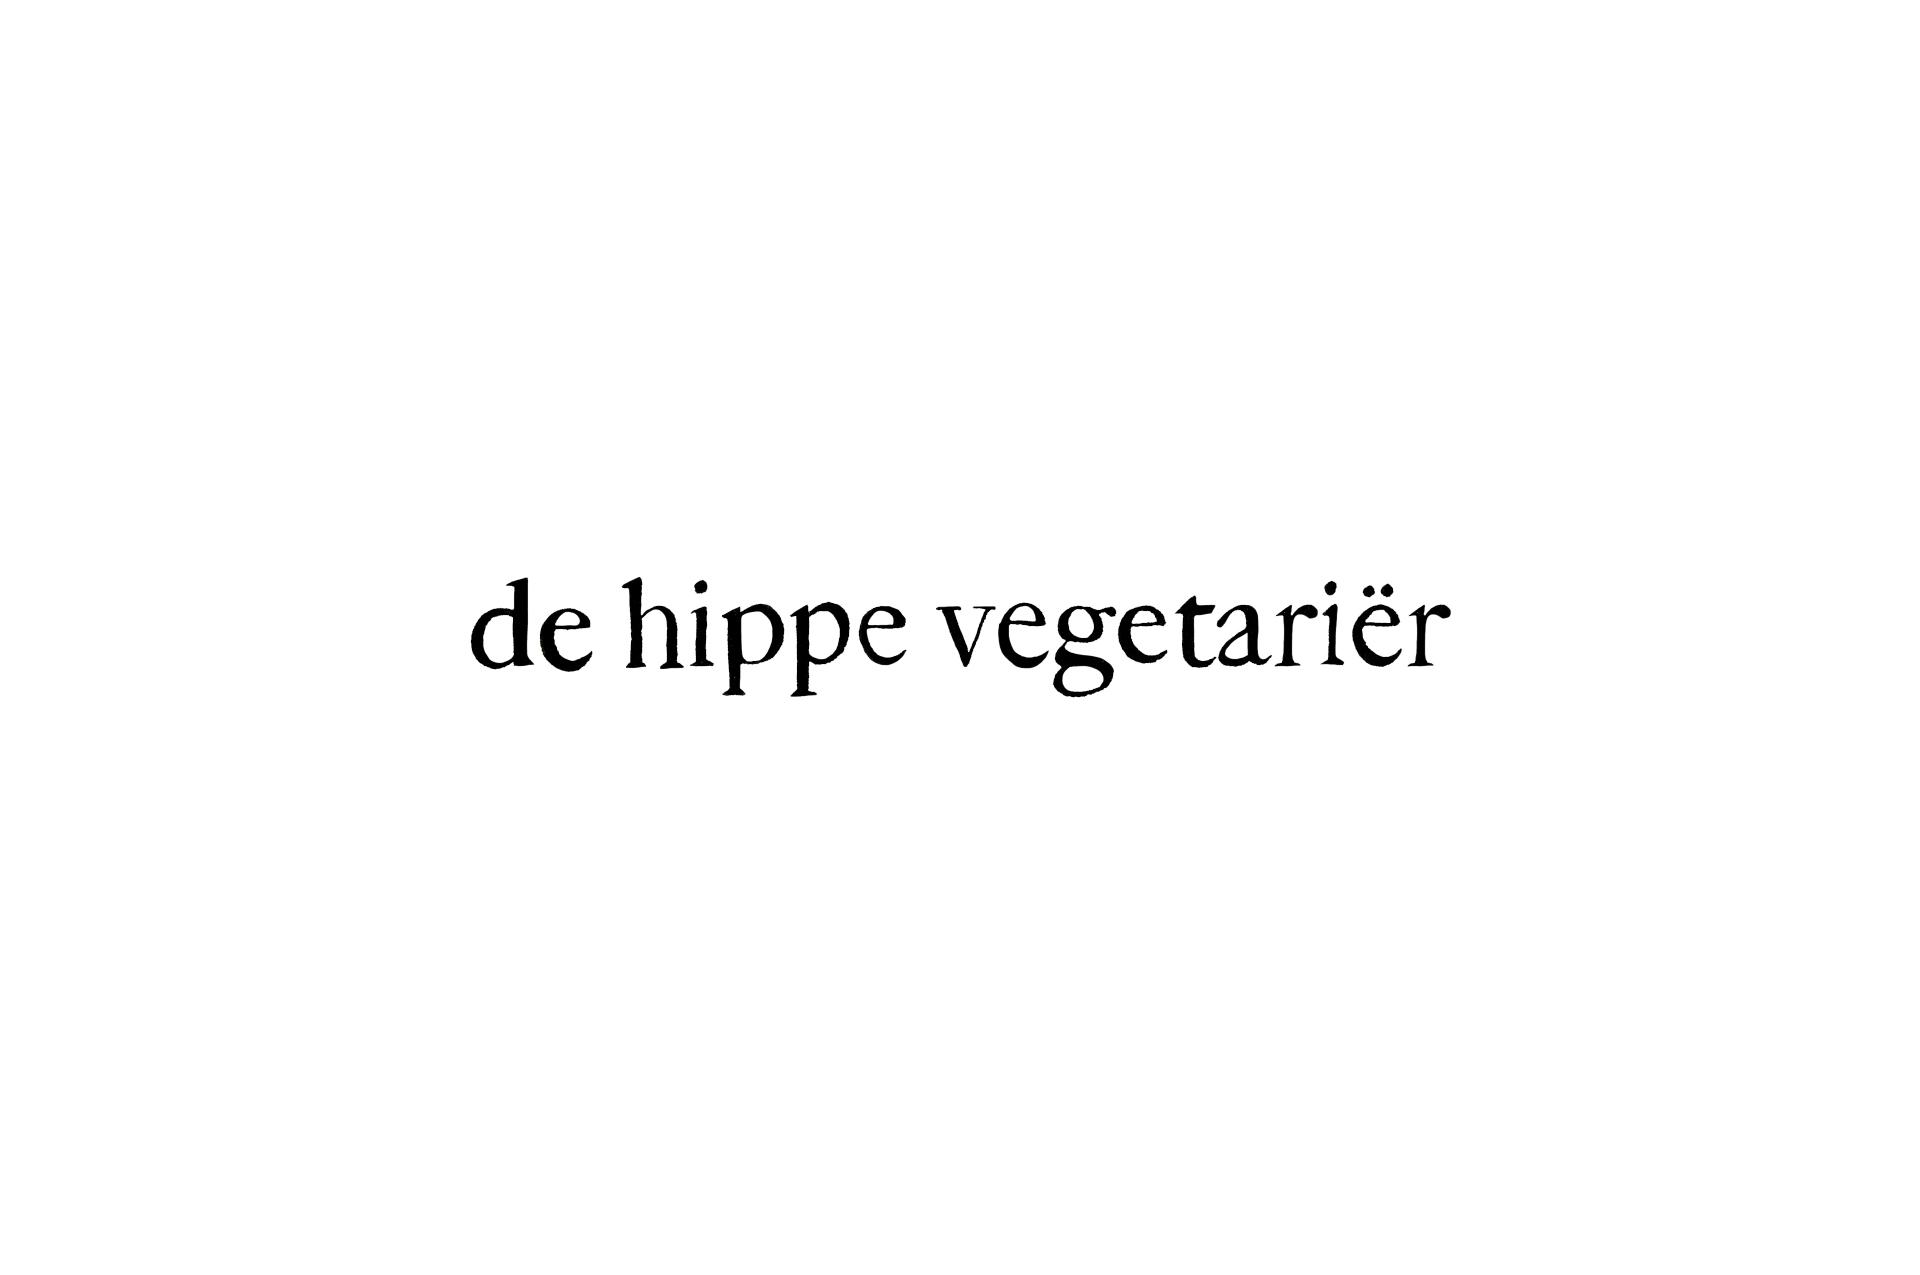 hippe-vegetarier